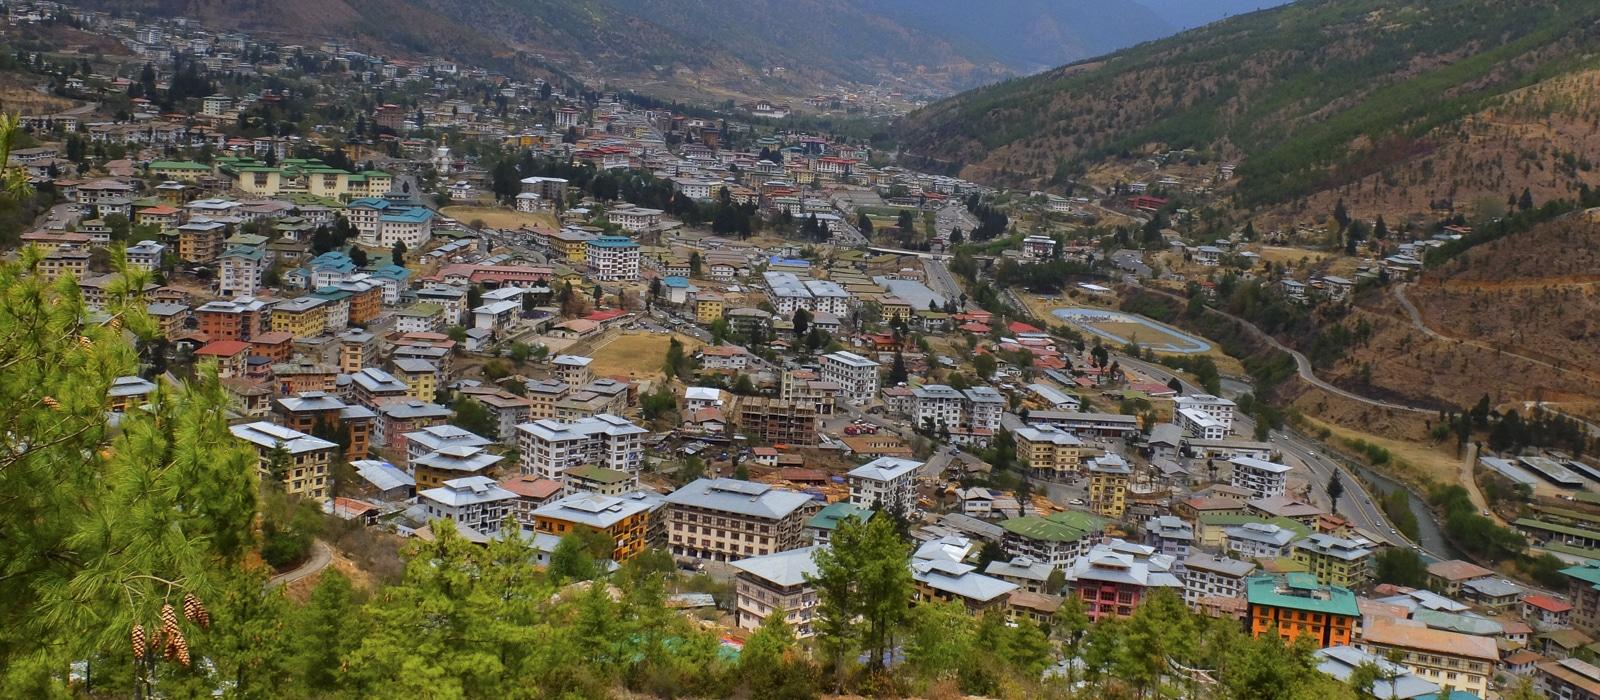 img-diapo-entete - Nepal-bouthan-1600x700-13.jpg